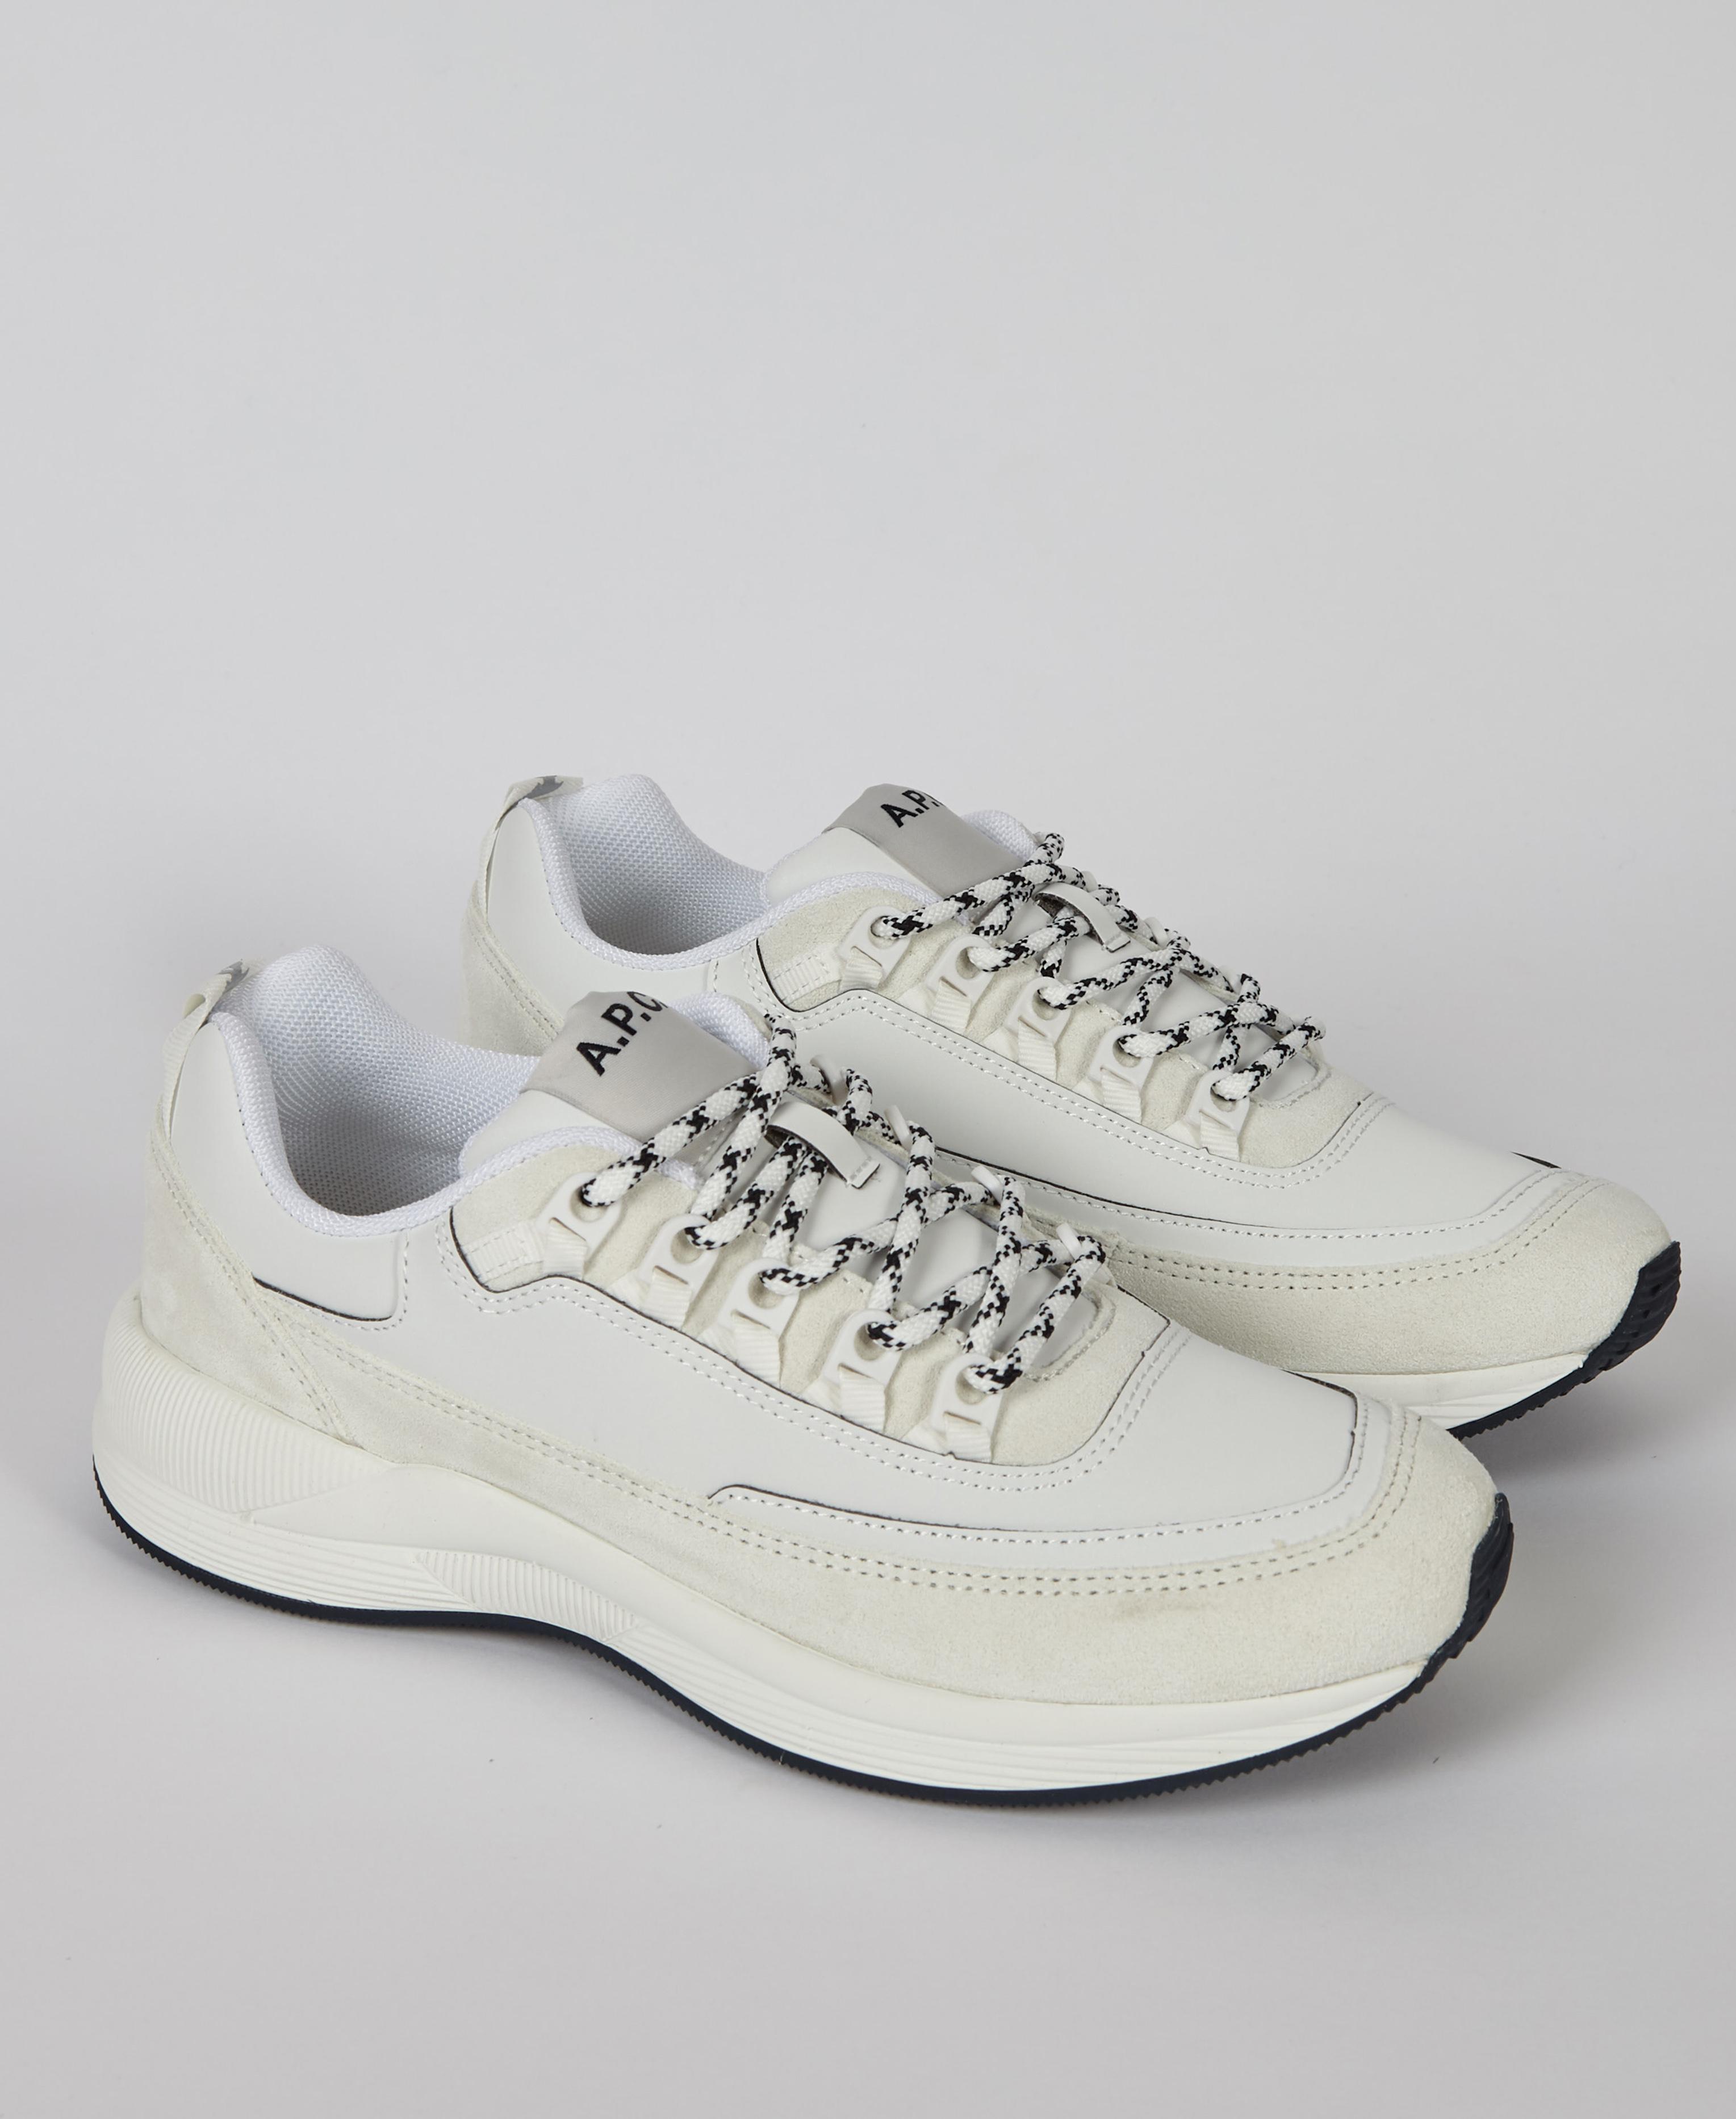 A.P.C Men's Running Homme Sneakers lQlZr5ktCJ